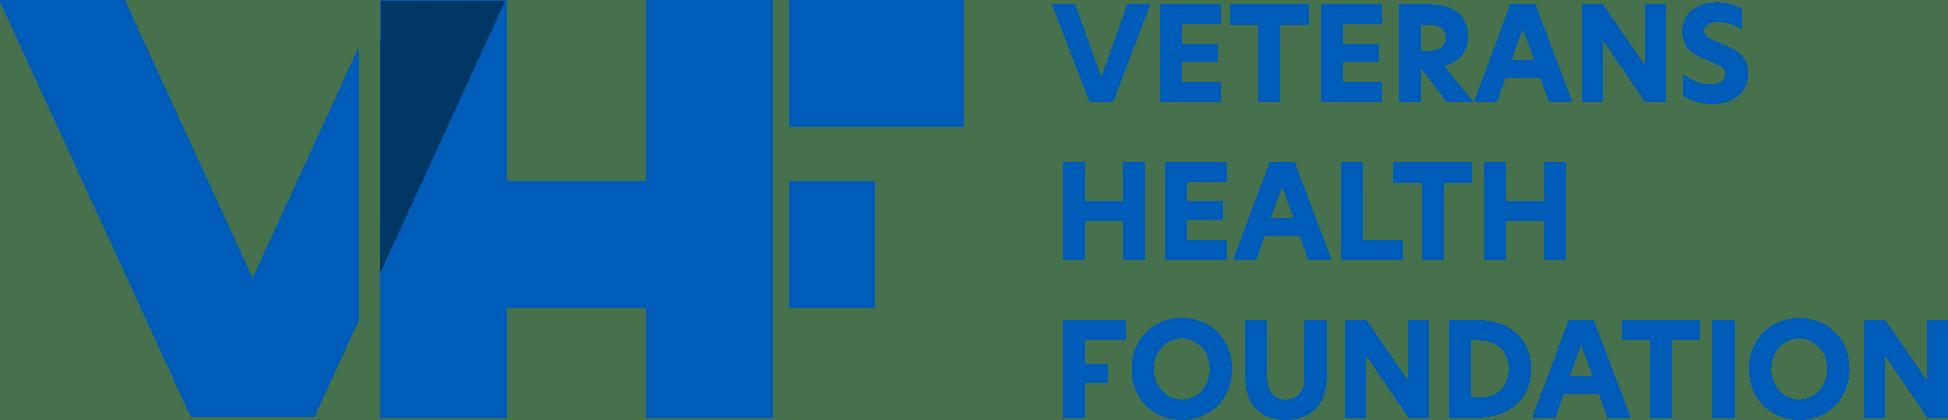 Veterans Health Foundation